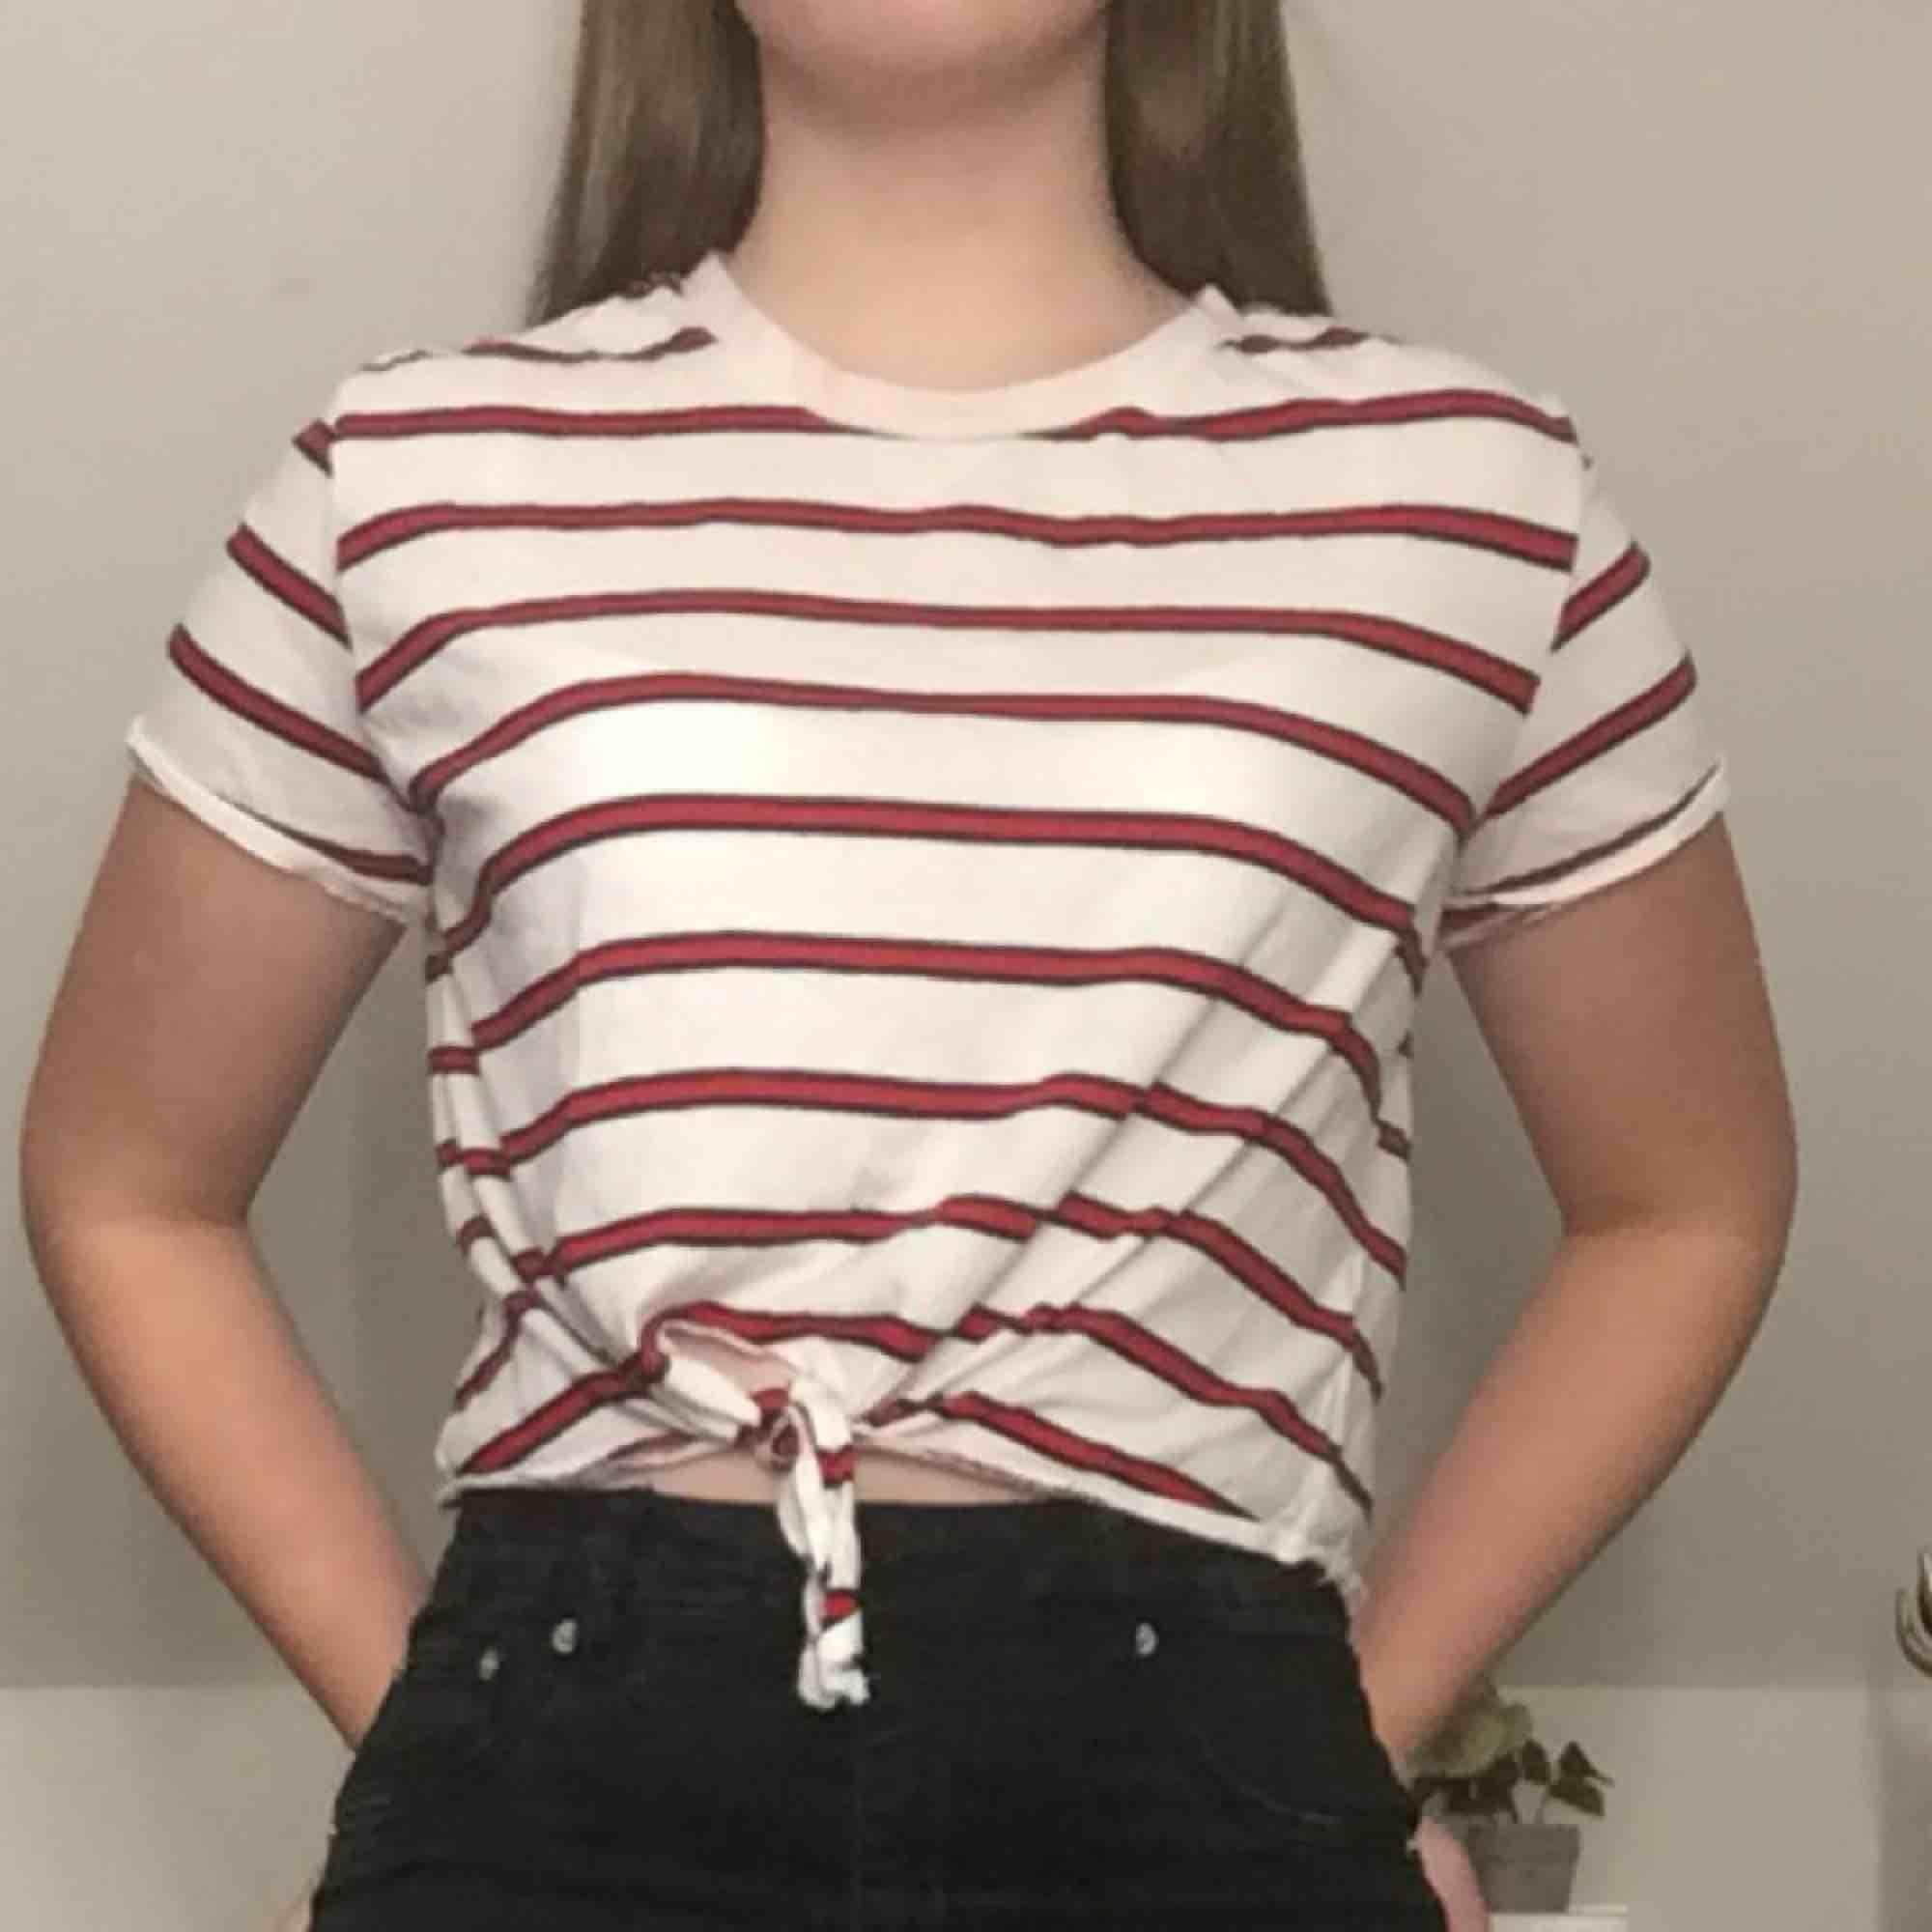 Svart-röd randig t-shirt med knytning i bottnen! . T-shirts.